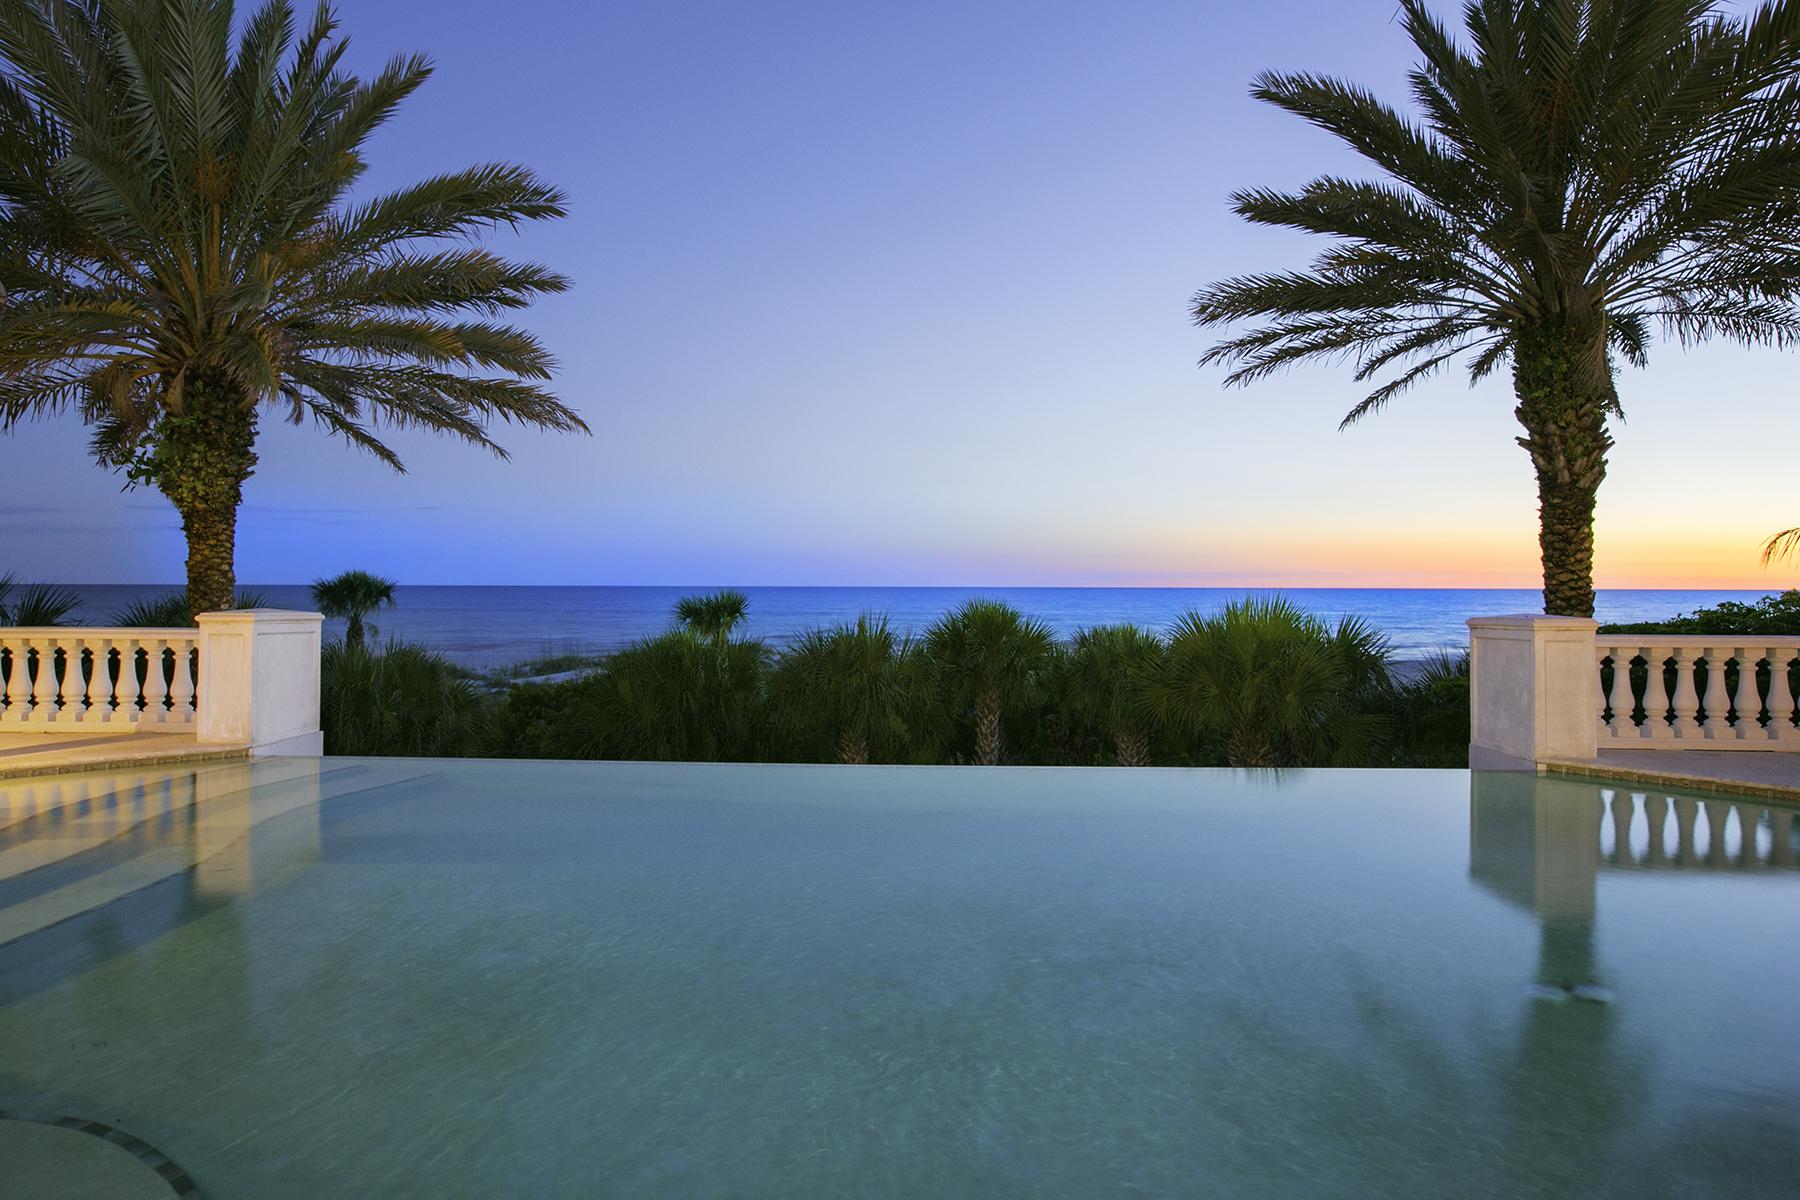 Additional photo for property listing at LONGBOAT KEY 1  Villa Del Sogno,  Longboat Key, Florida 34228 United States